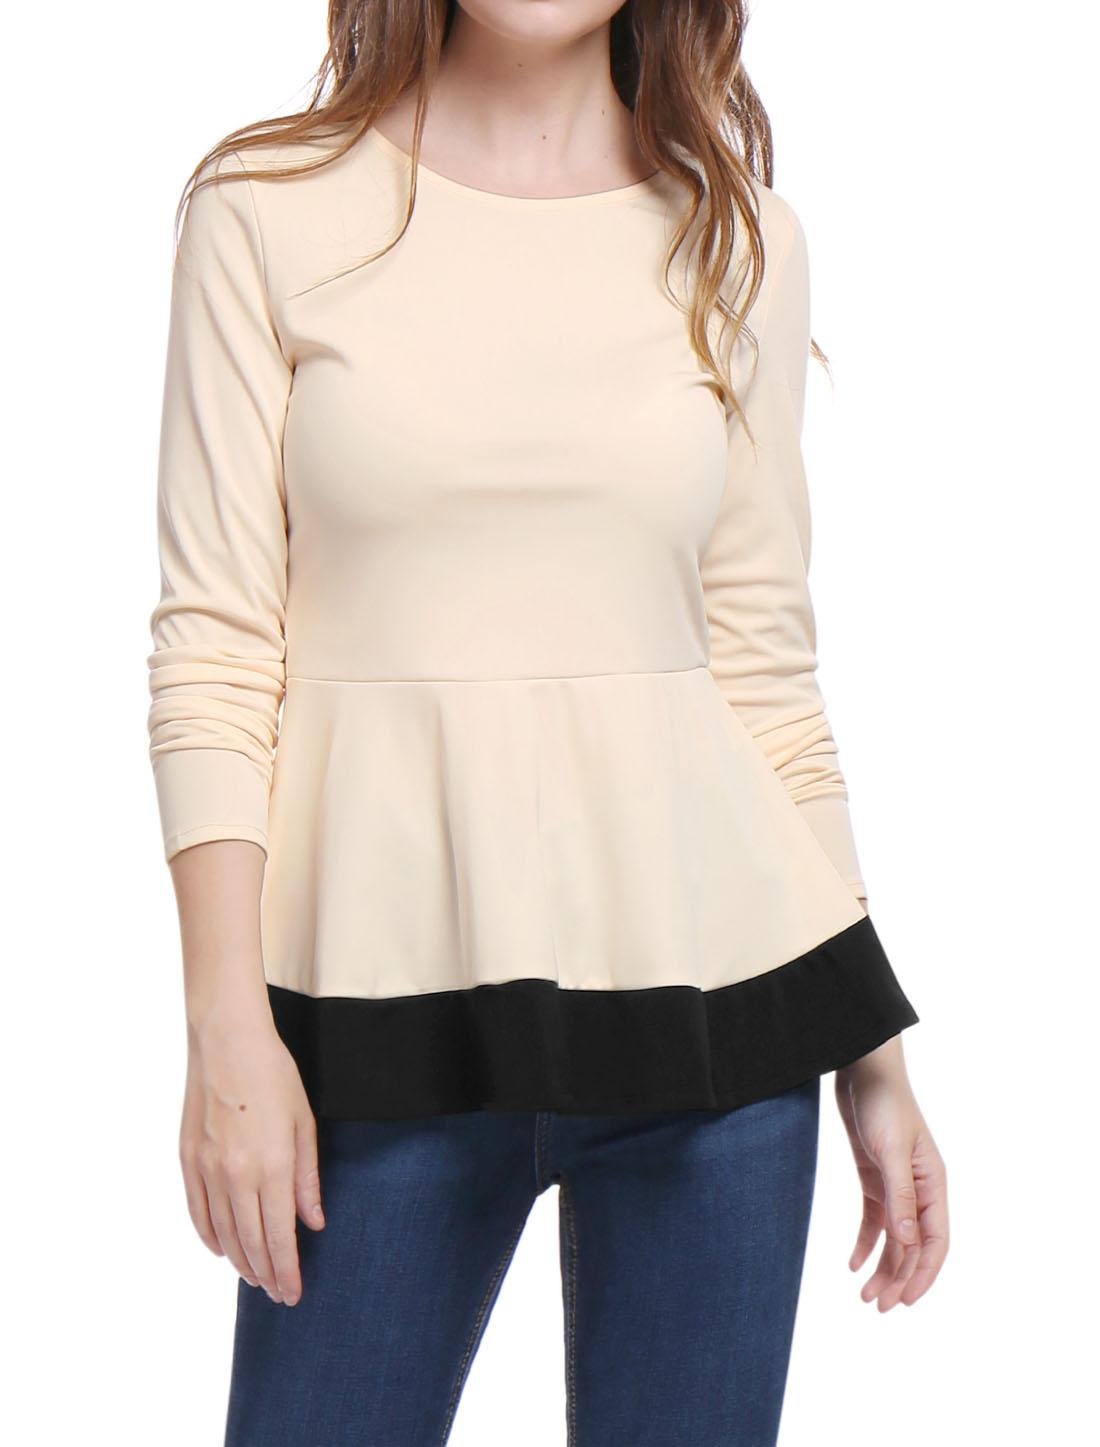 Allegra K Women Long Sleeves Color Block Ruffled Peplum Blouse Beige S